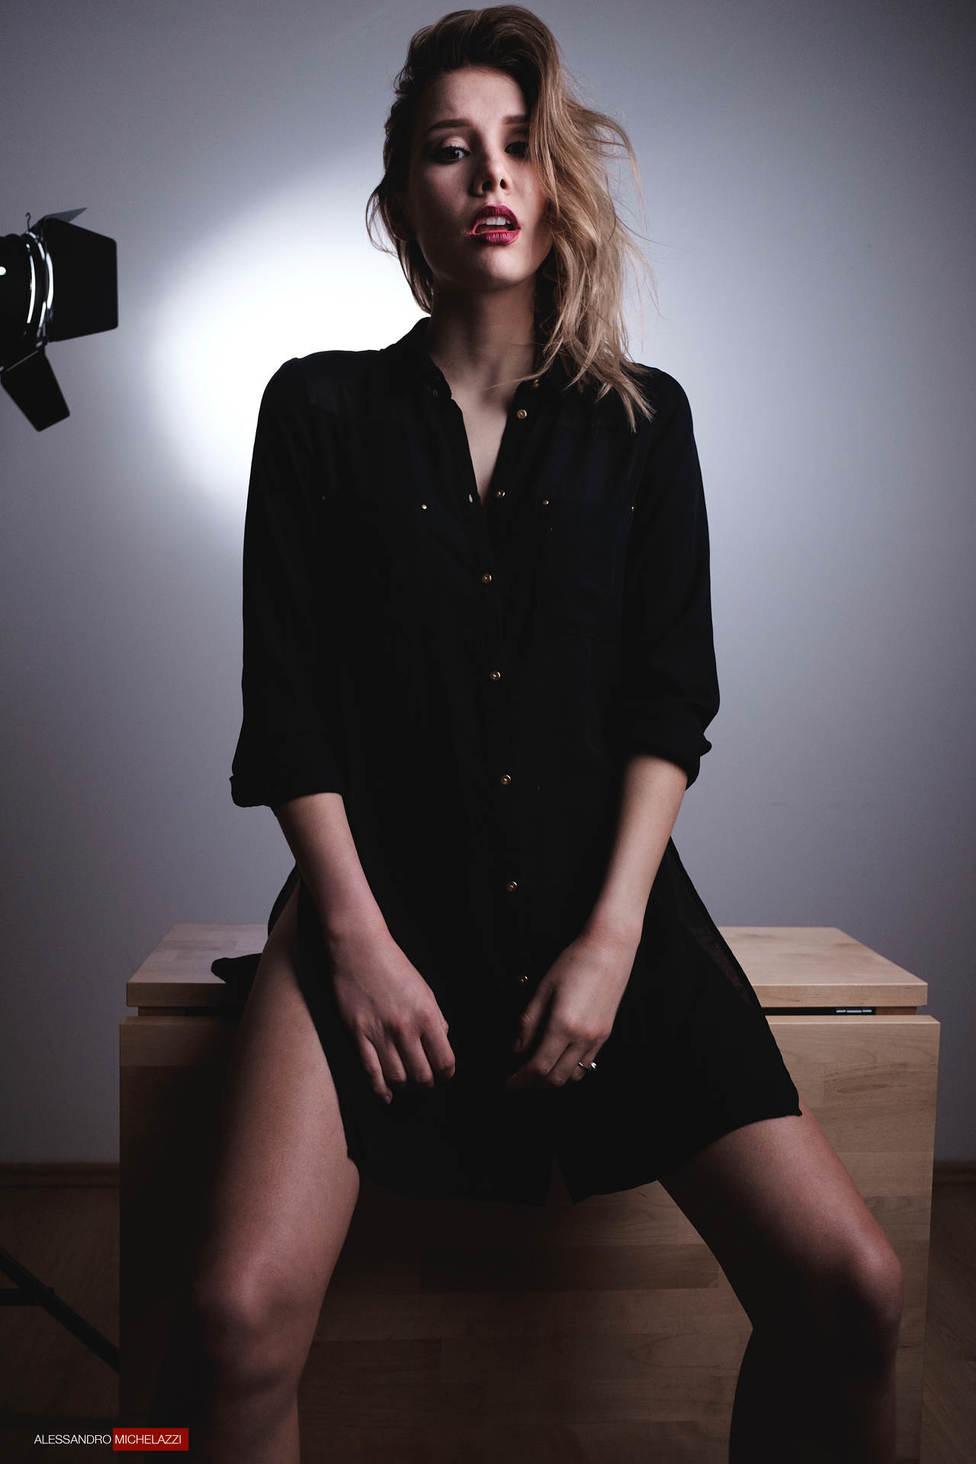 Alessandro-Michelazzi-Photography-X70-Fashion-Test-15